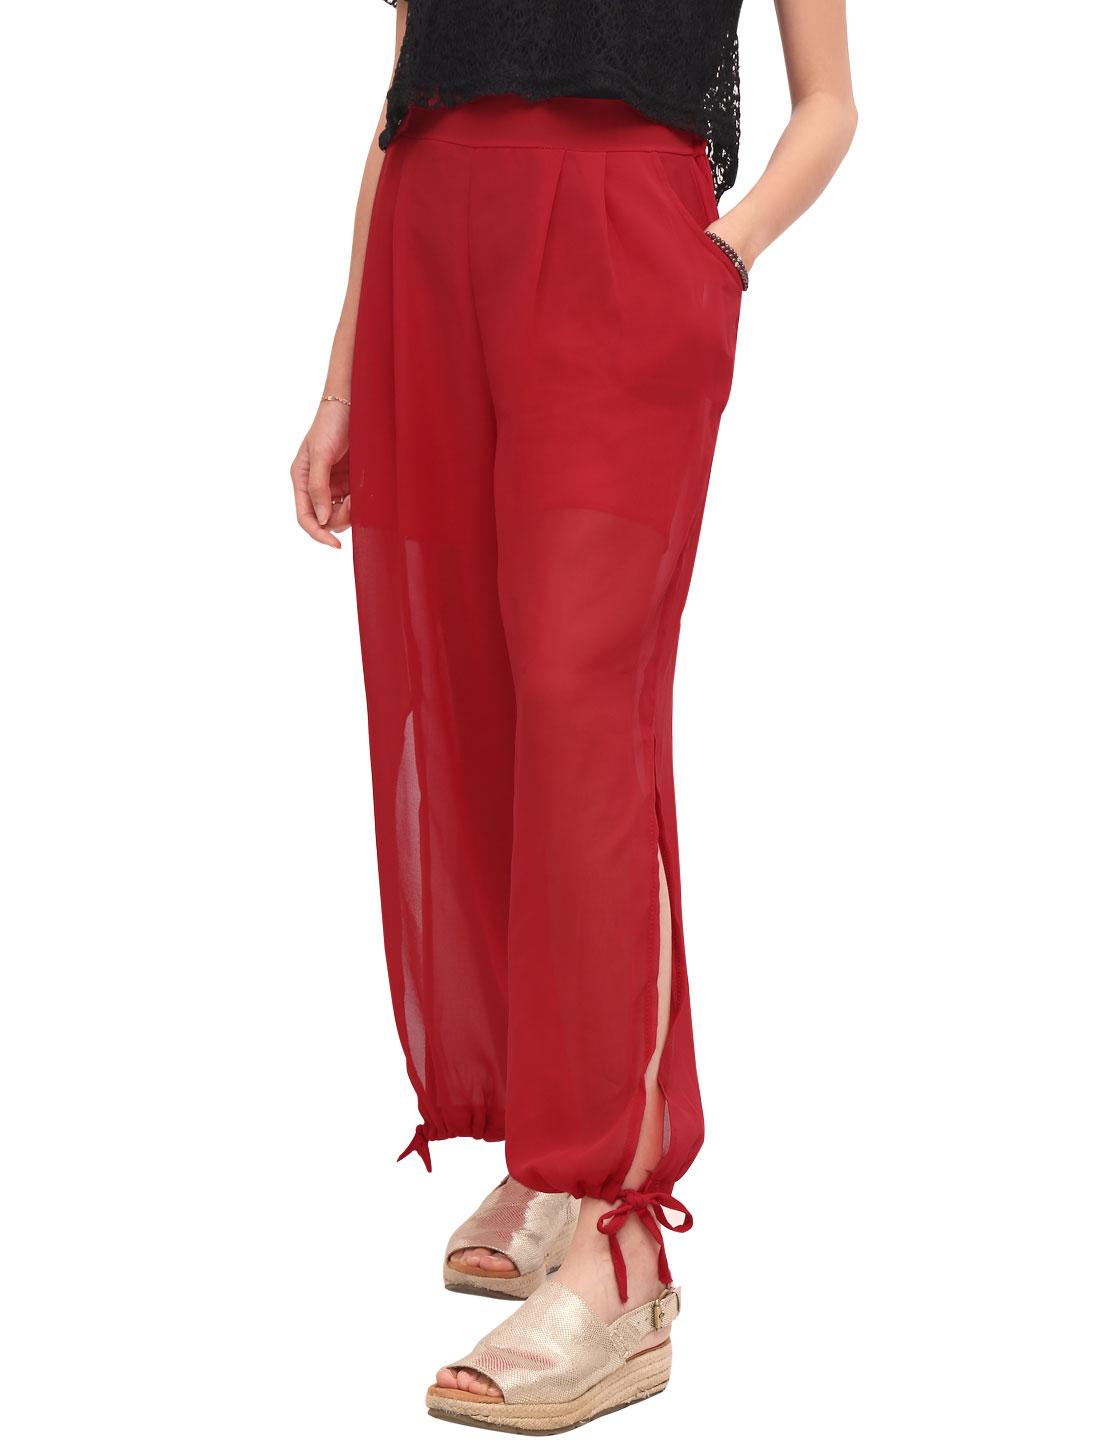 Women High Rise Elastic Waist Drawstring Cuffs Casual Pants Red XS